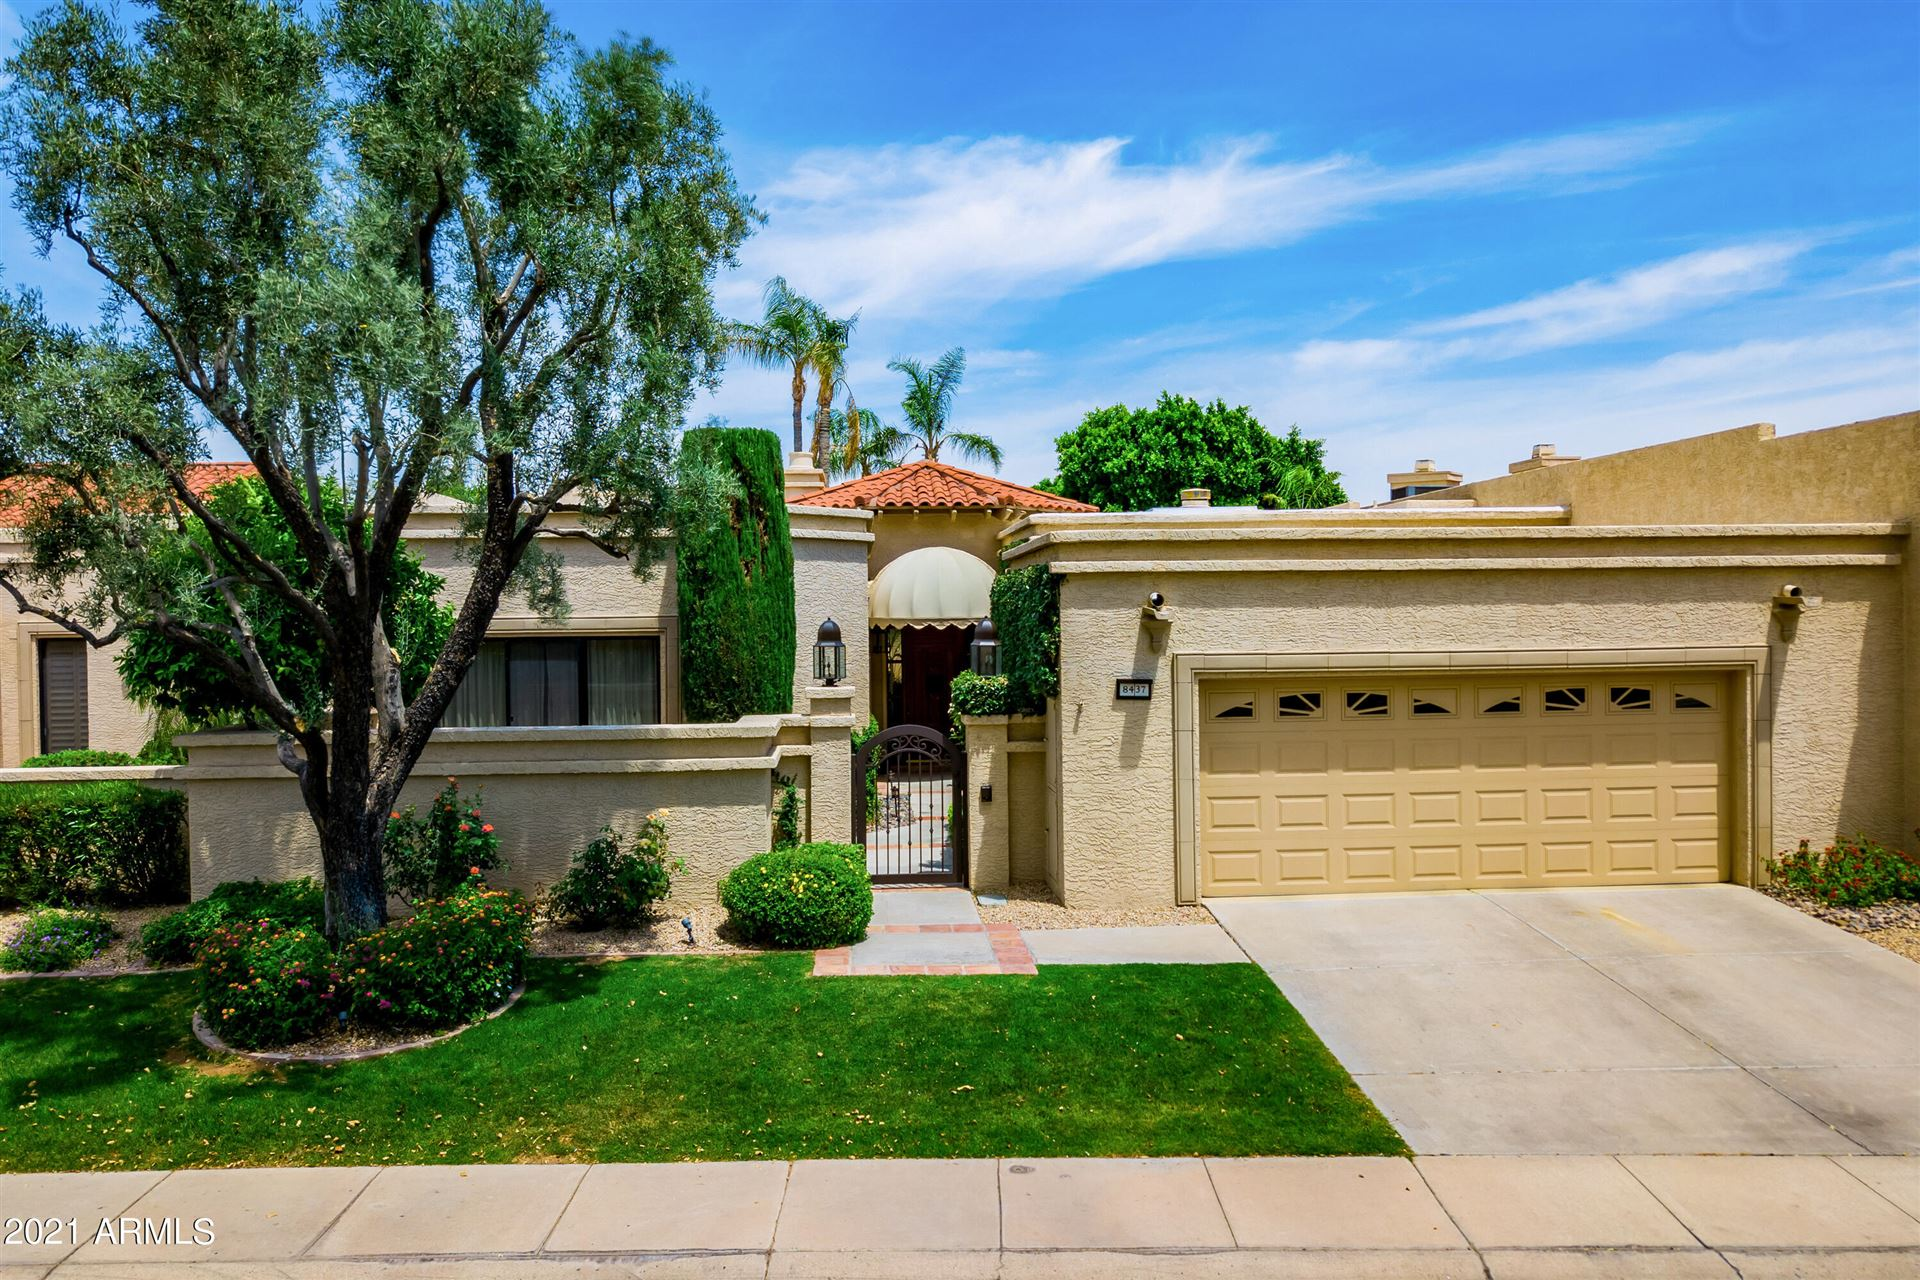 8437 N 84TH Street, Scottsdale, AZ 85258 - MLS#: 6265083